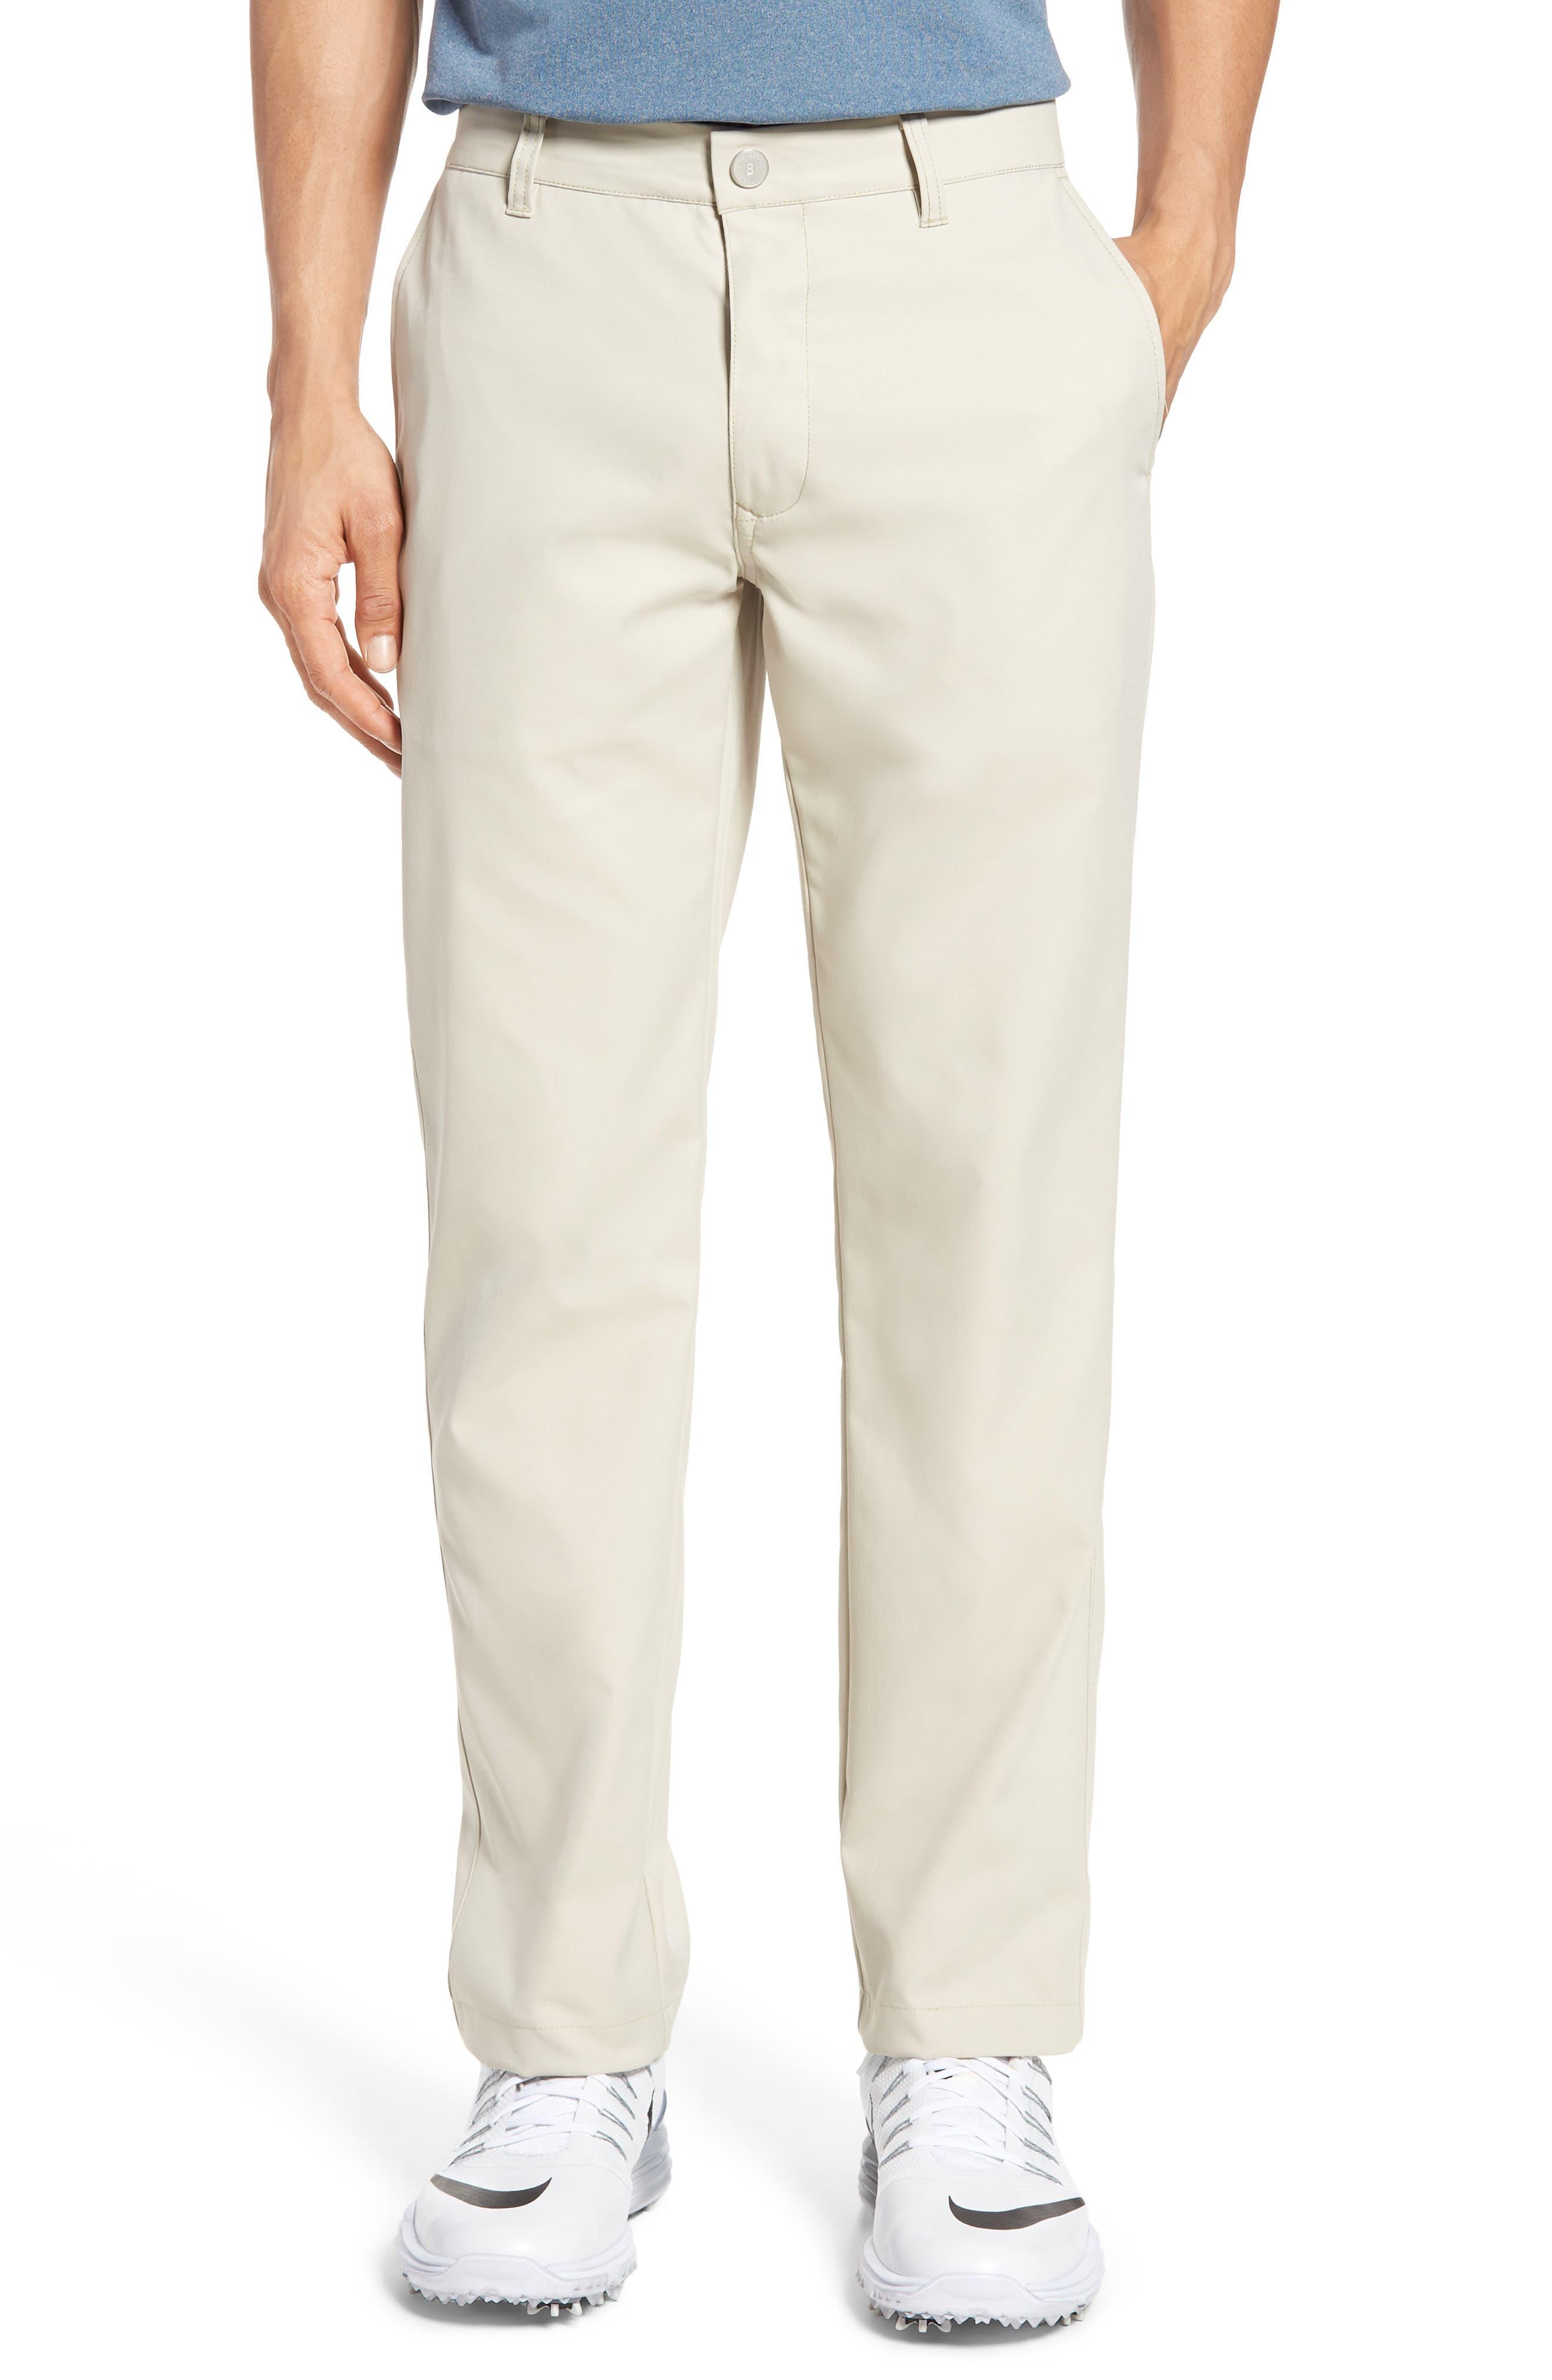 Highland Slim Fit Golf Pants,                             Main thumbnail 1, color,                             STONE